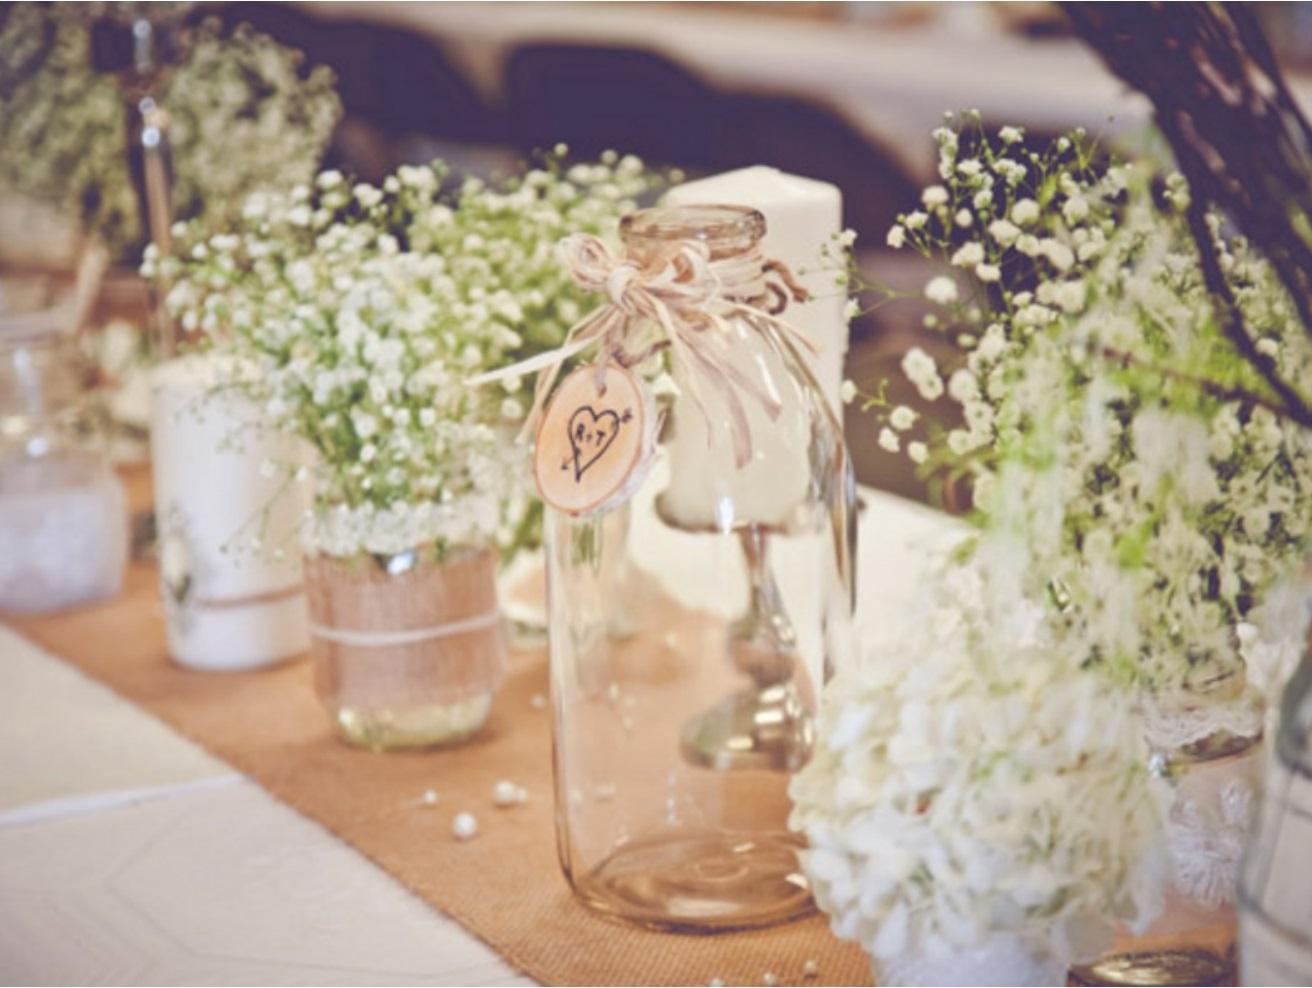 Using Hessian Burlap Material At Your Wedding